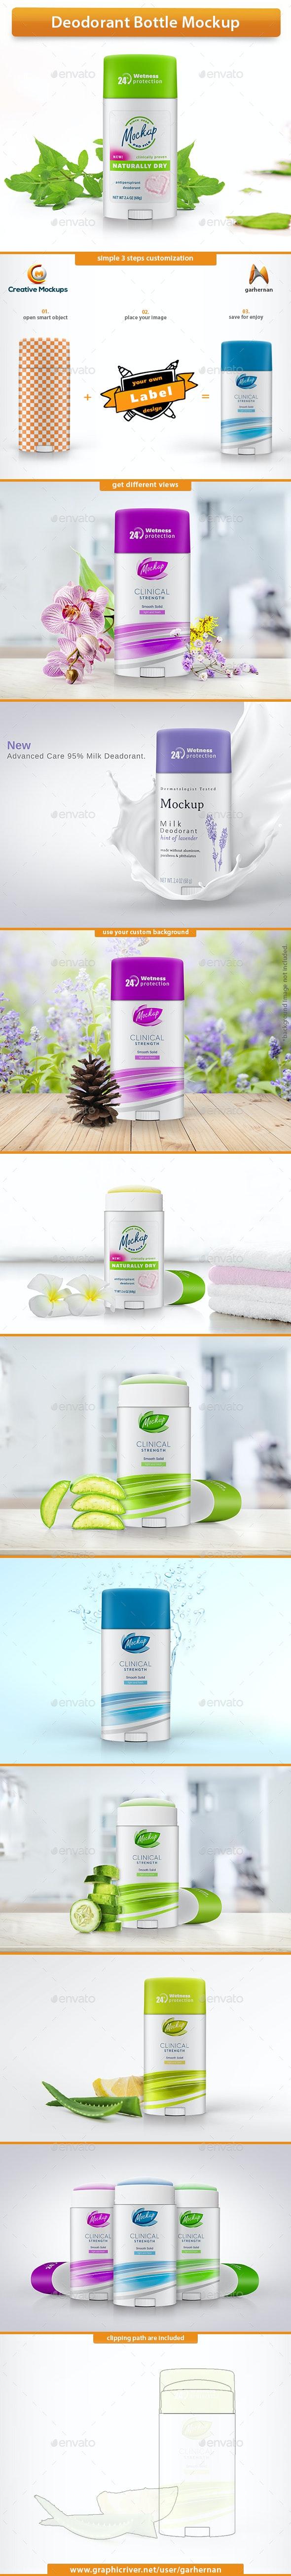 Deodorant Bottle Mockup - Product Mock-Ups Graphics